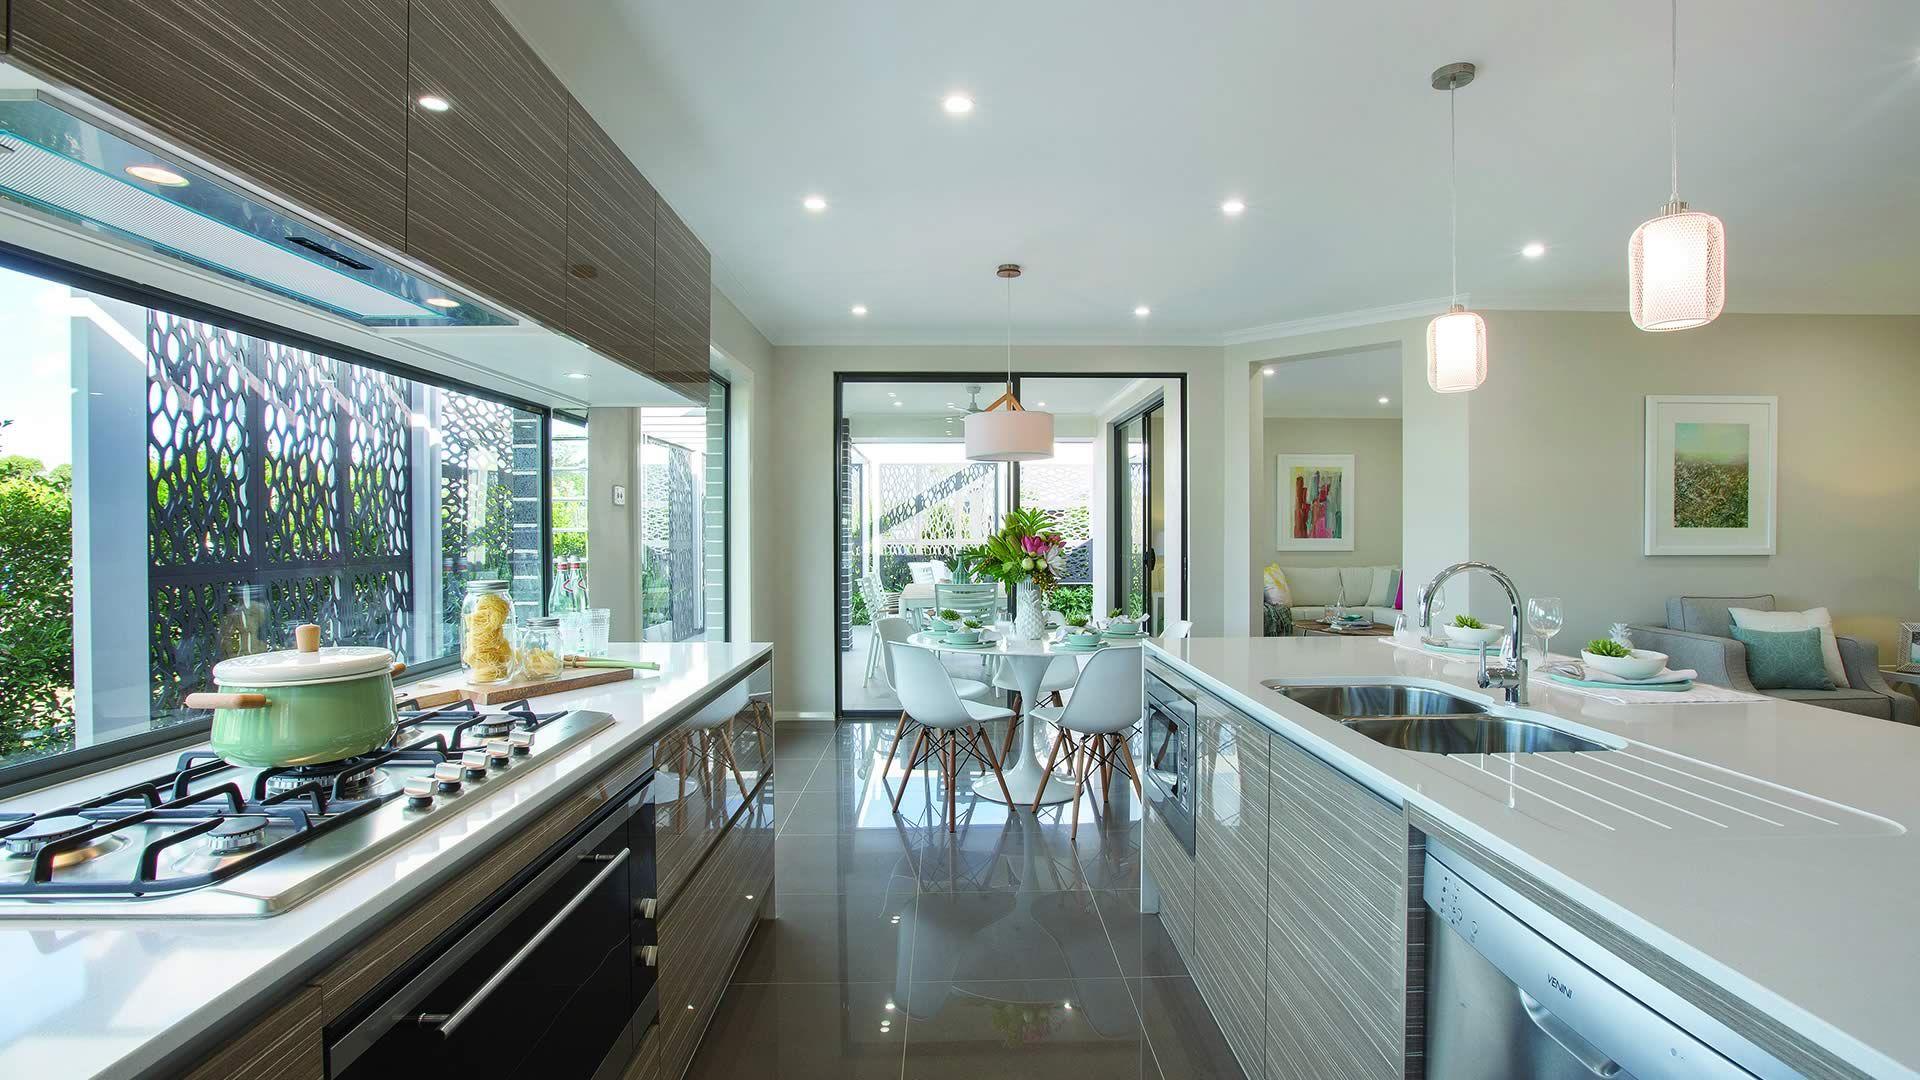 Sheffield - Lifestyle Series | Eden Brae Homes | Kitchens ...